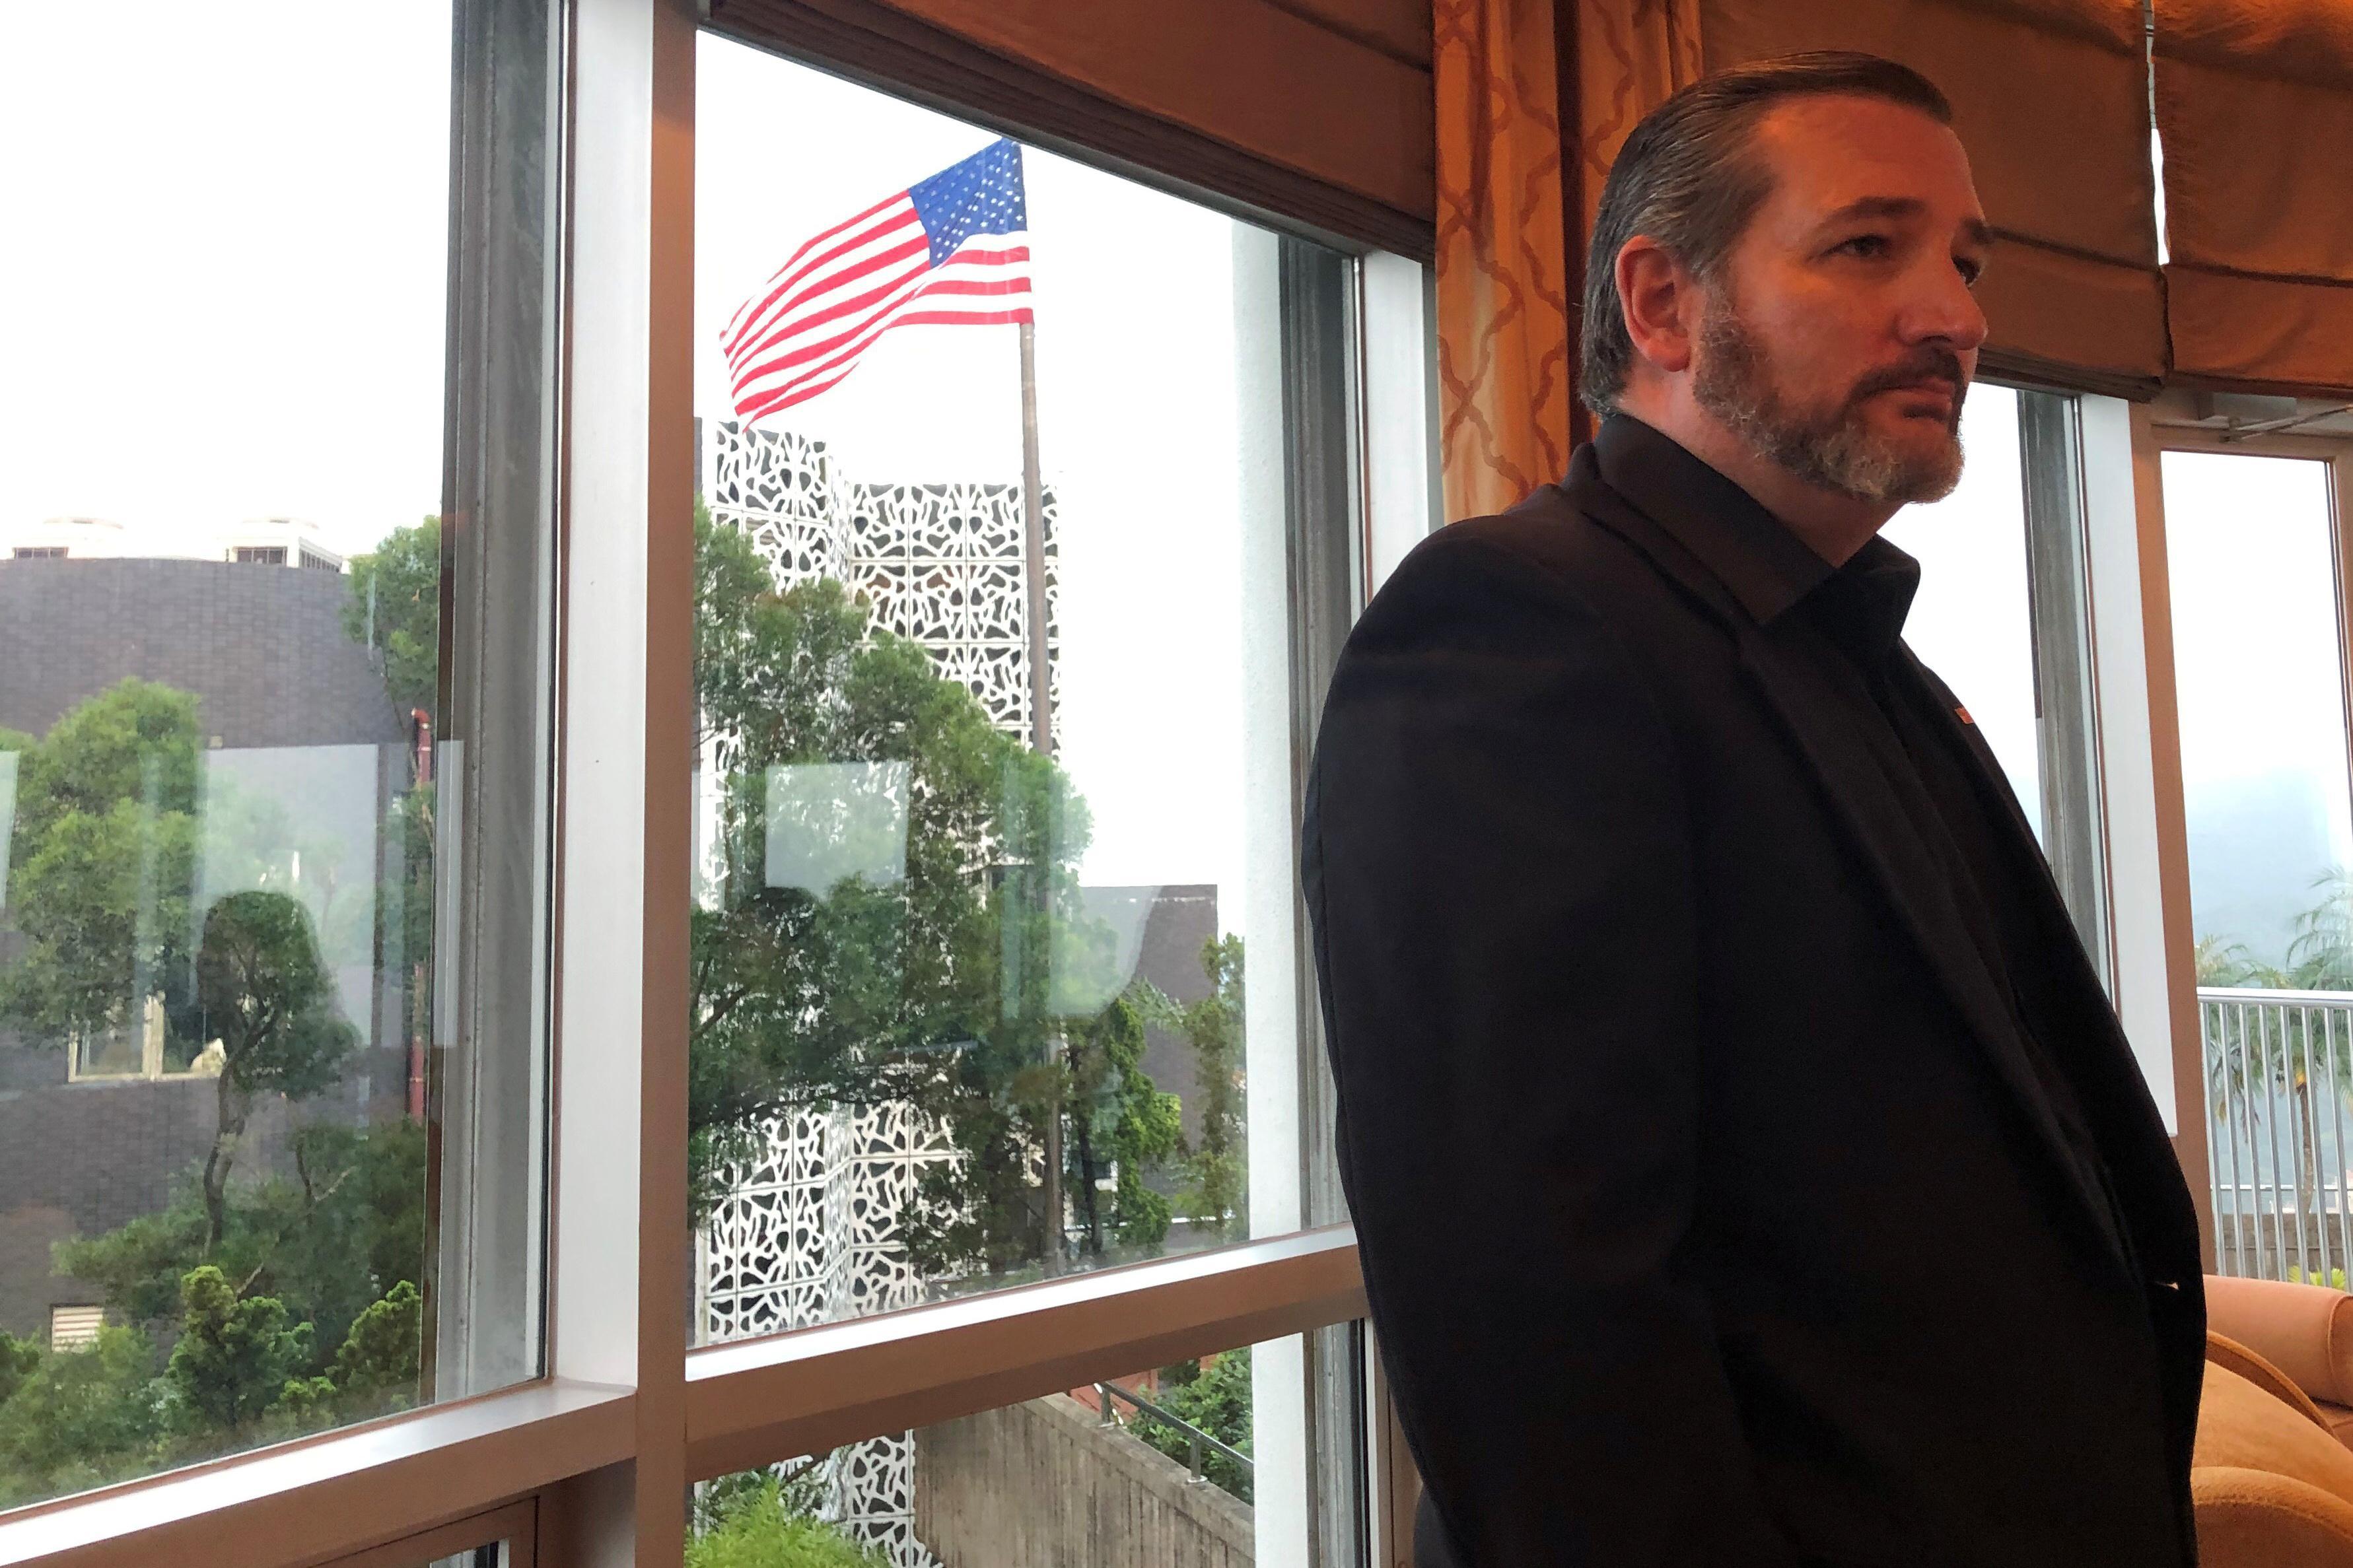 HK leader ditches meeting Ted Cruz, says the U.S. senator